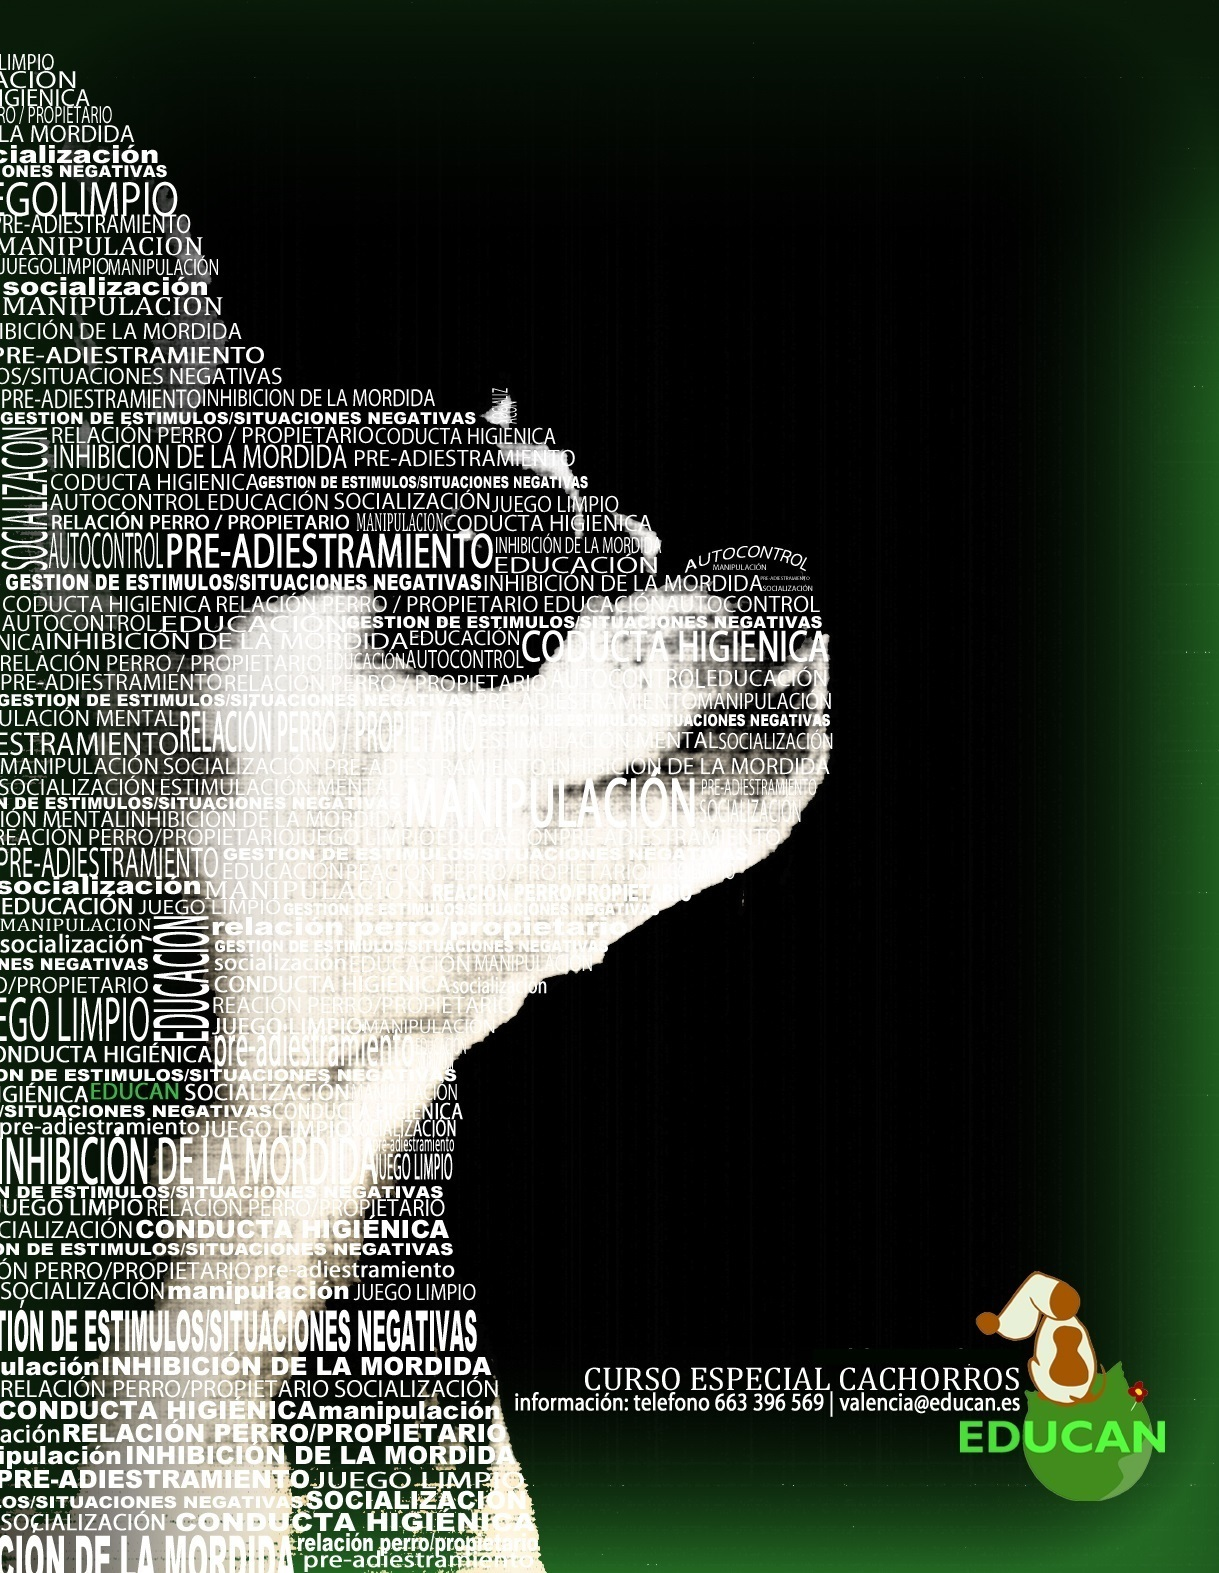 Curso para Cachorros |Valencia 27 oct 2015.